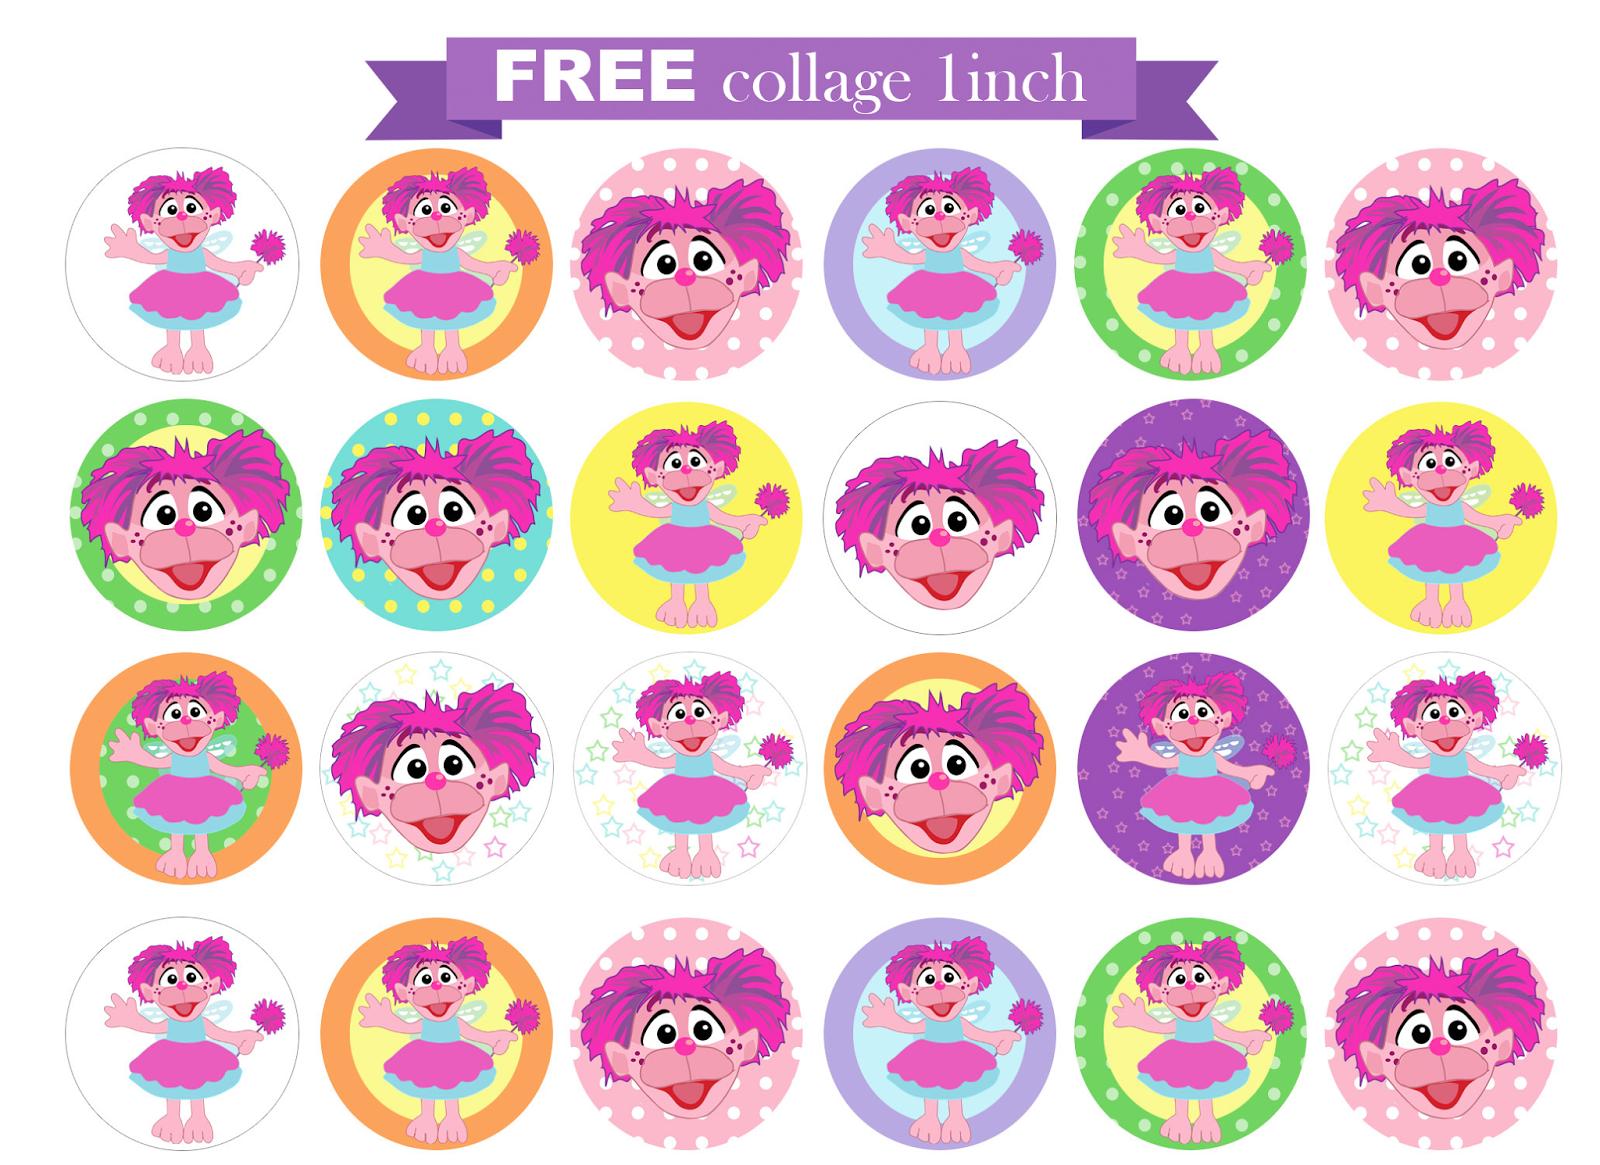 free printable invitation Abby Cadabby FREE collage circle – Abby Cadabby Birthday Invitations